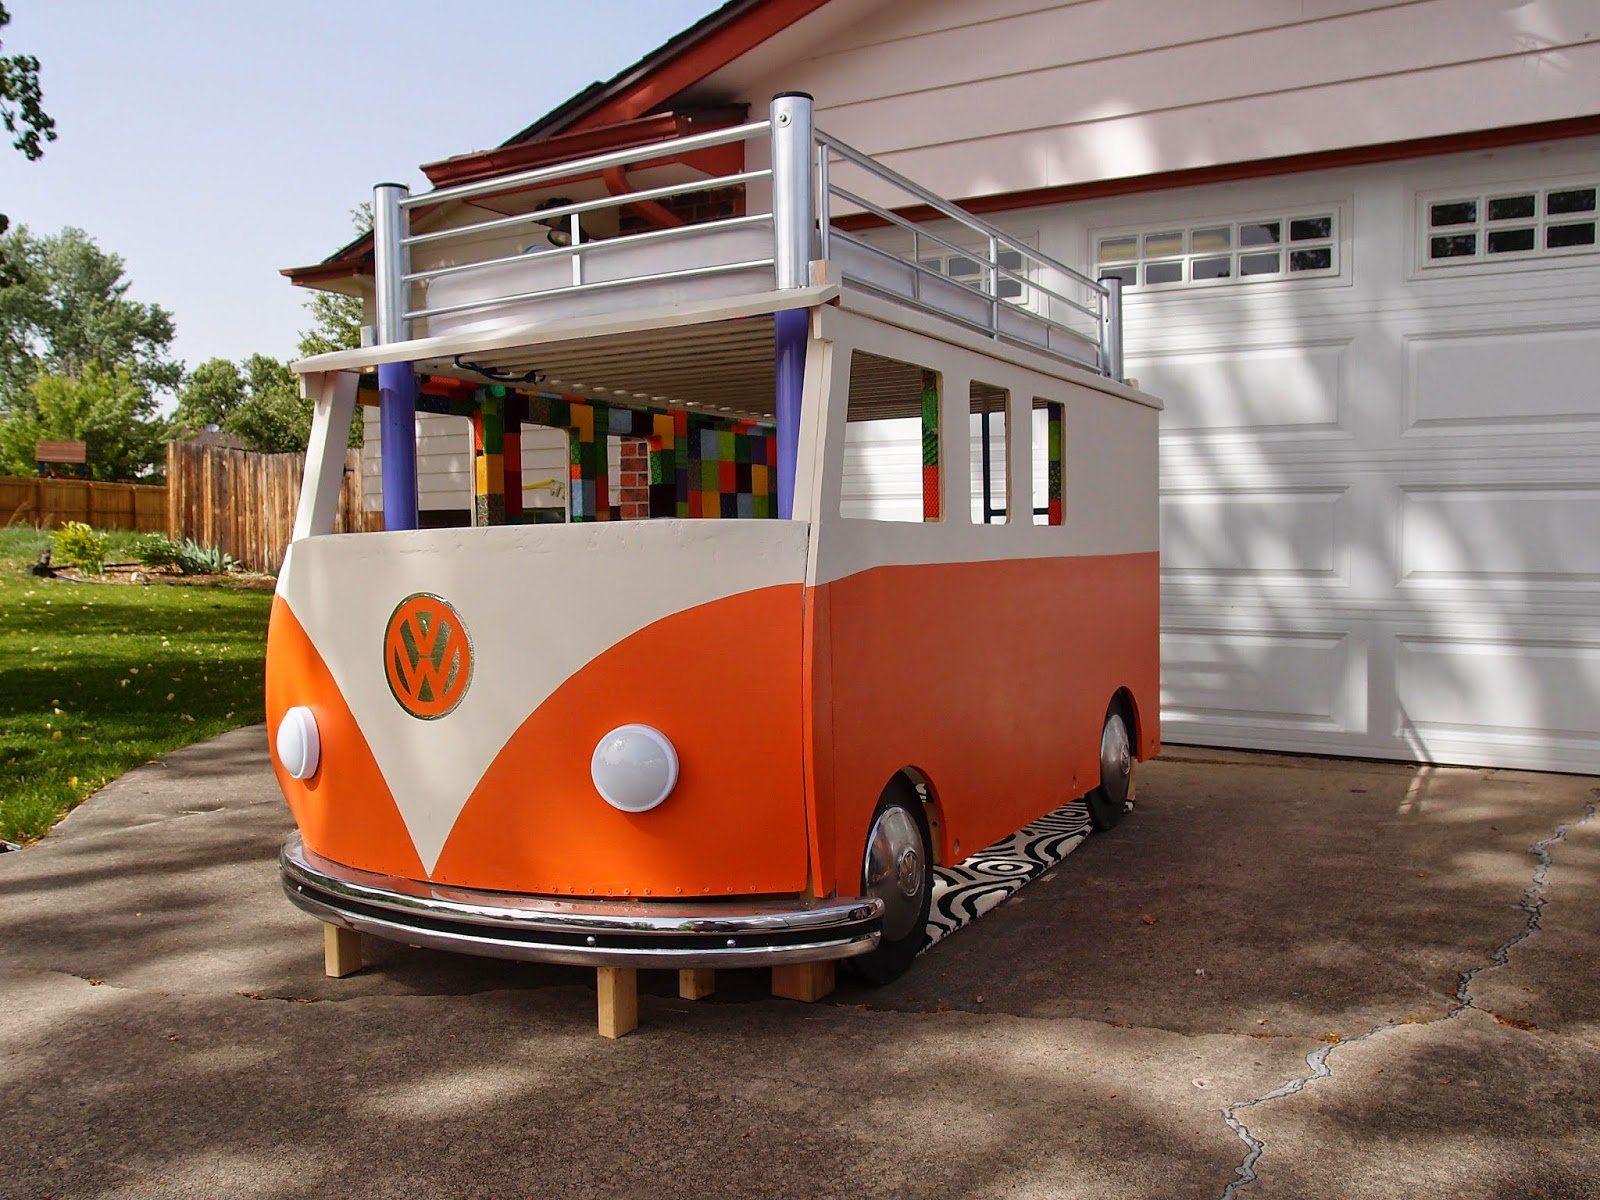 Etagenbett Vw Bus : Happy camper dad builds toddler a vw bus bed diy is way of